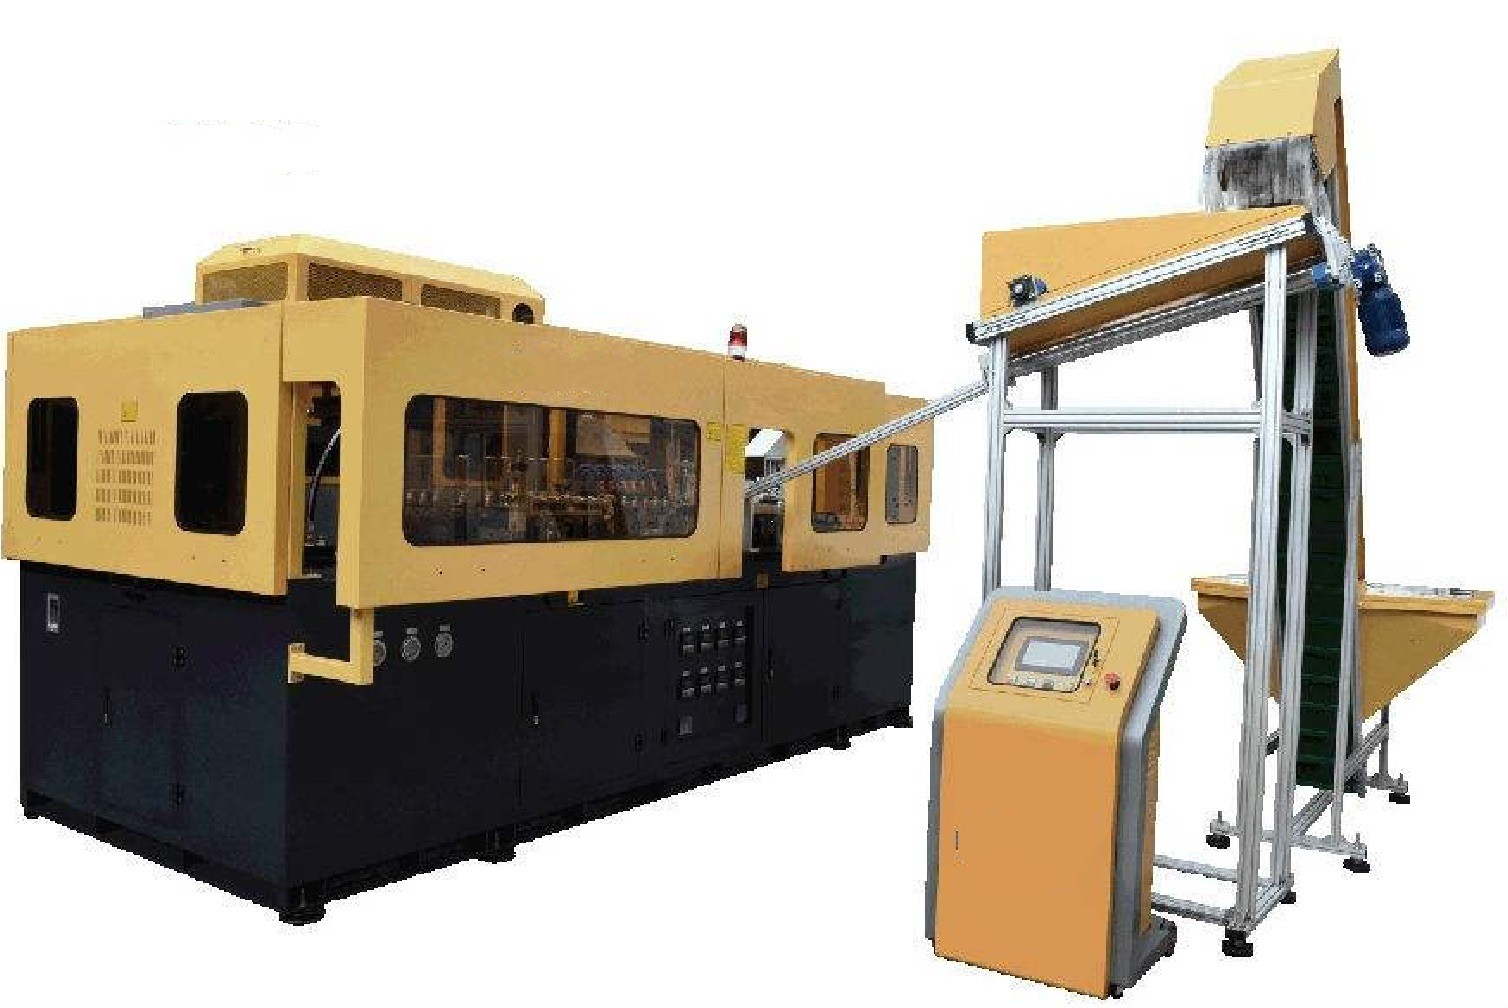 9 Cavities PET Bottle Blow Molding Machine 6000-25000 Bottle / Hour Linear High Capacity